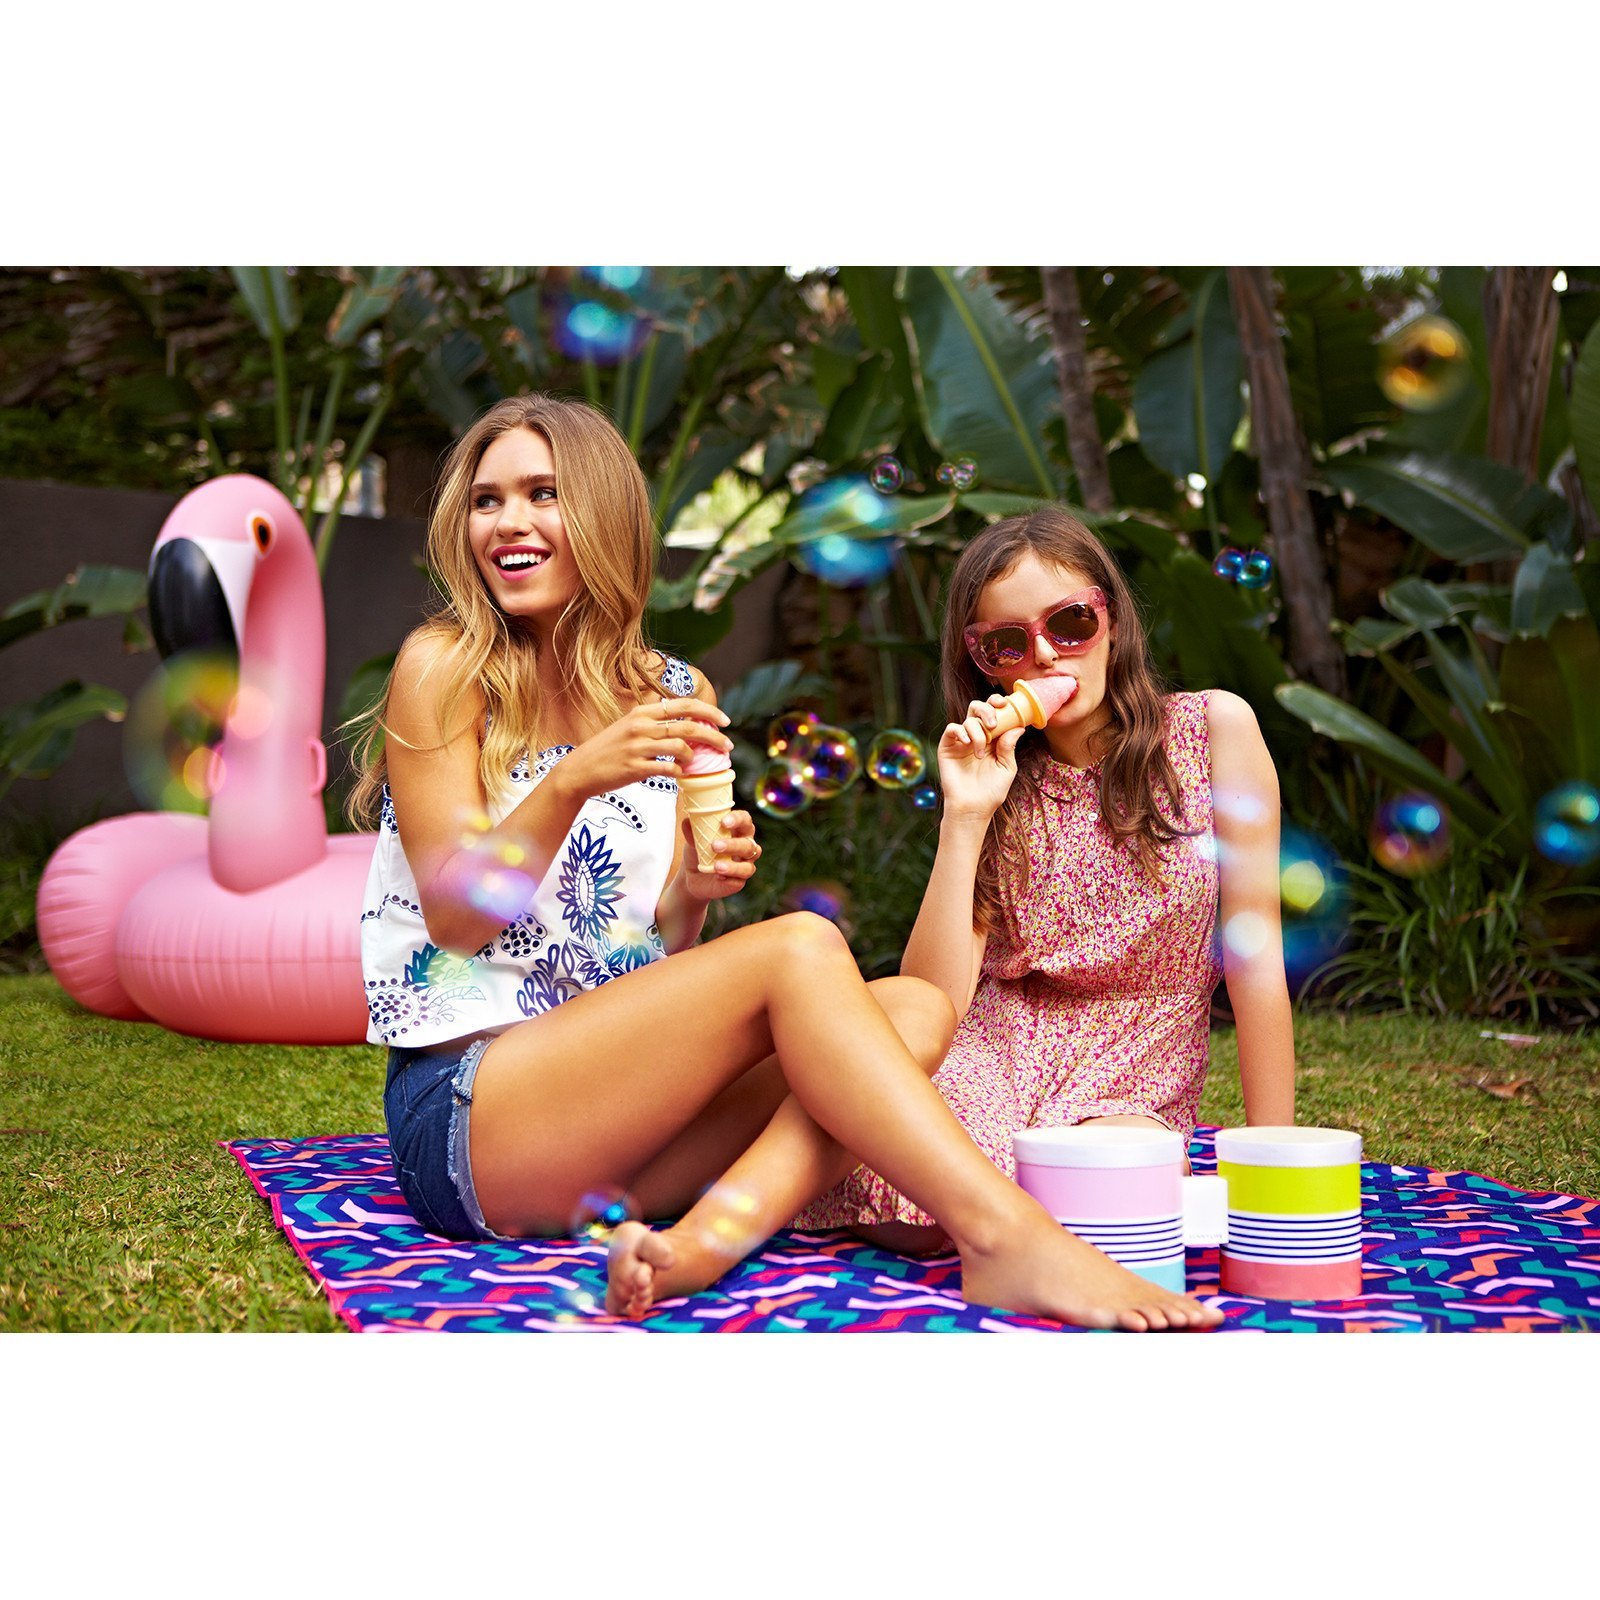 Sunnylife Luxury Adult Inflatable Pool Float Ride On Beach Toy - Pink Flamingo by SunnyLIFE (Image #6)